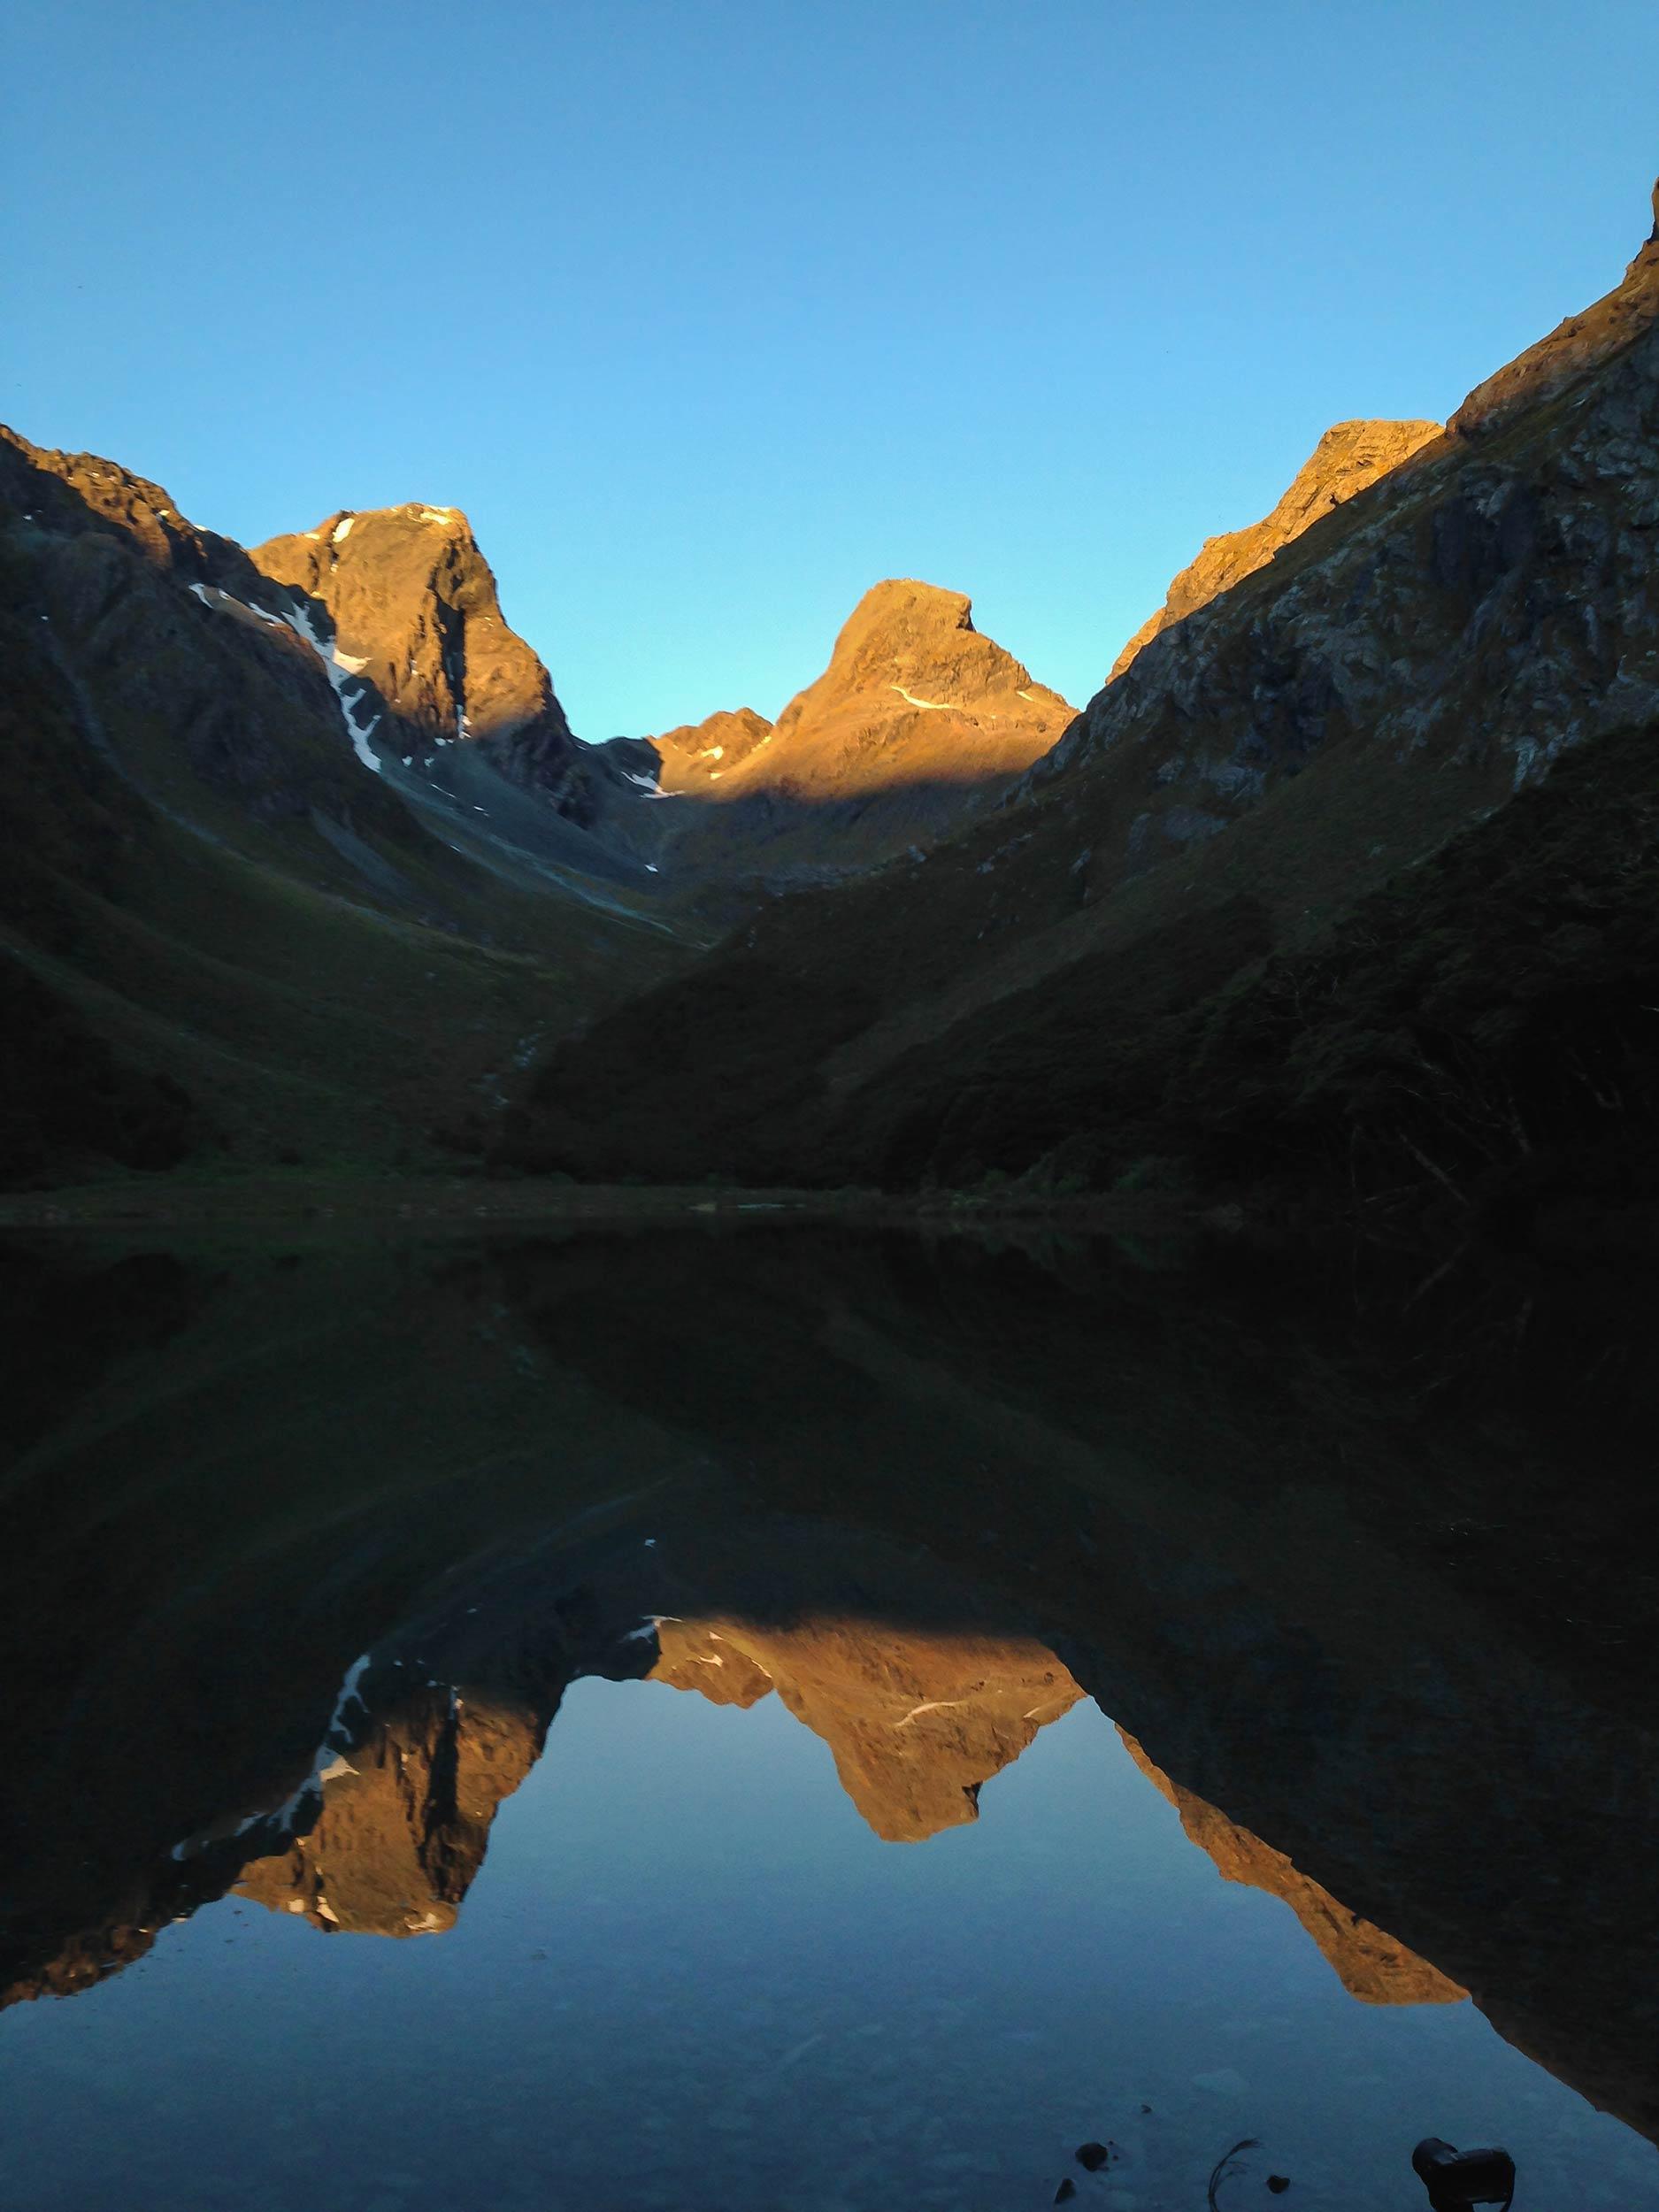 routeburn_track_lake_mackenzie_reflection_sunset.jpg